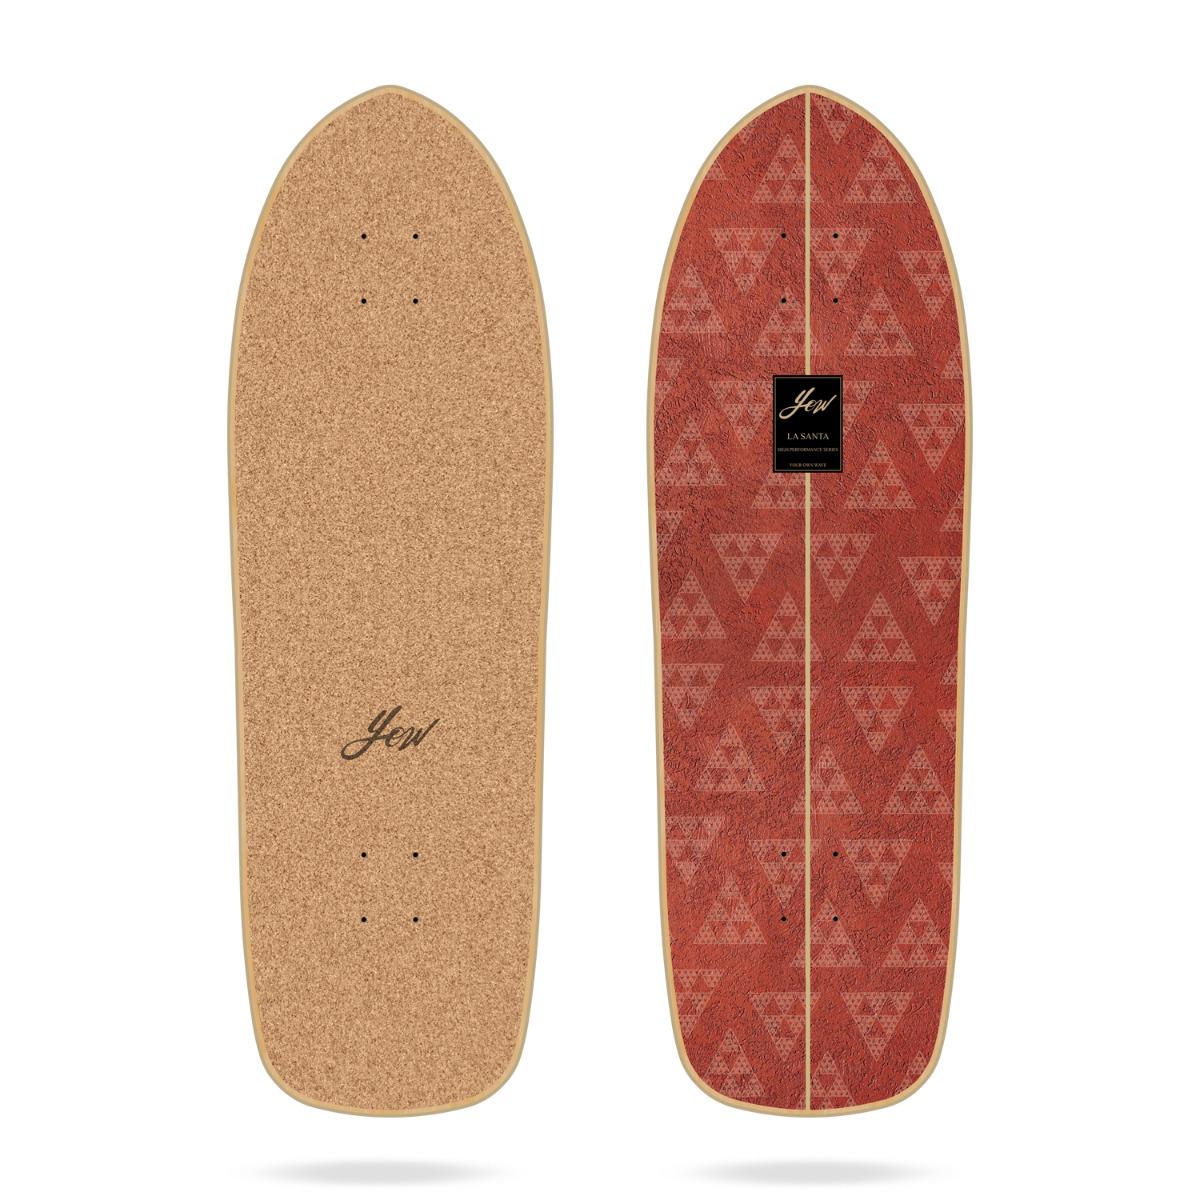 "Yow La Santa 33"" High Performance Series surfskate deck"